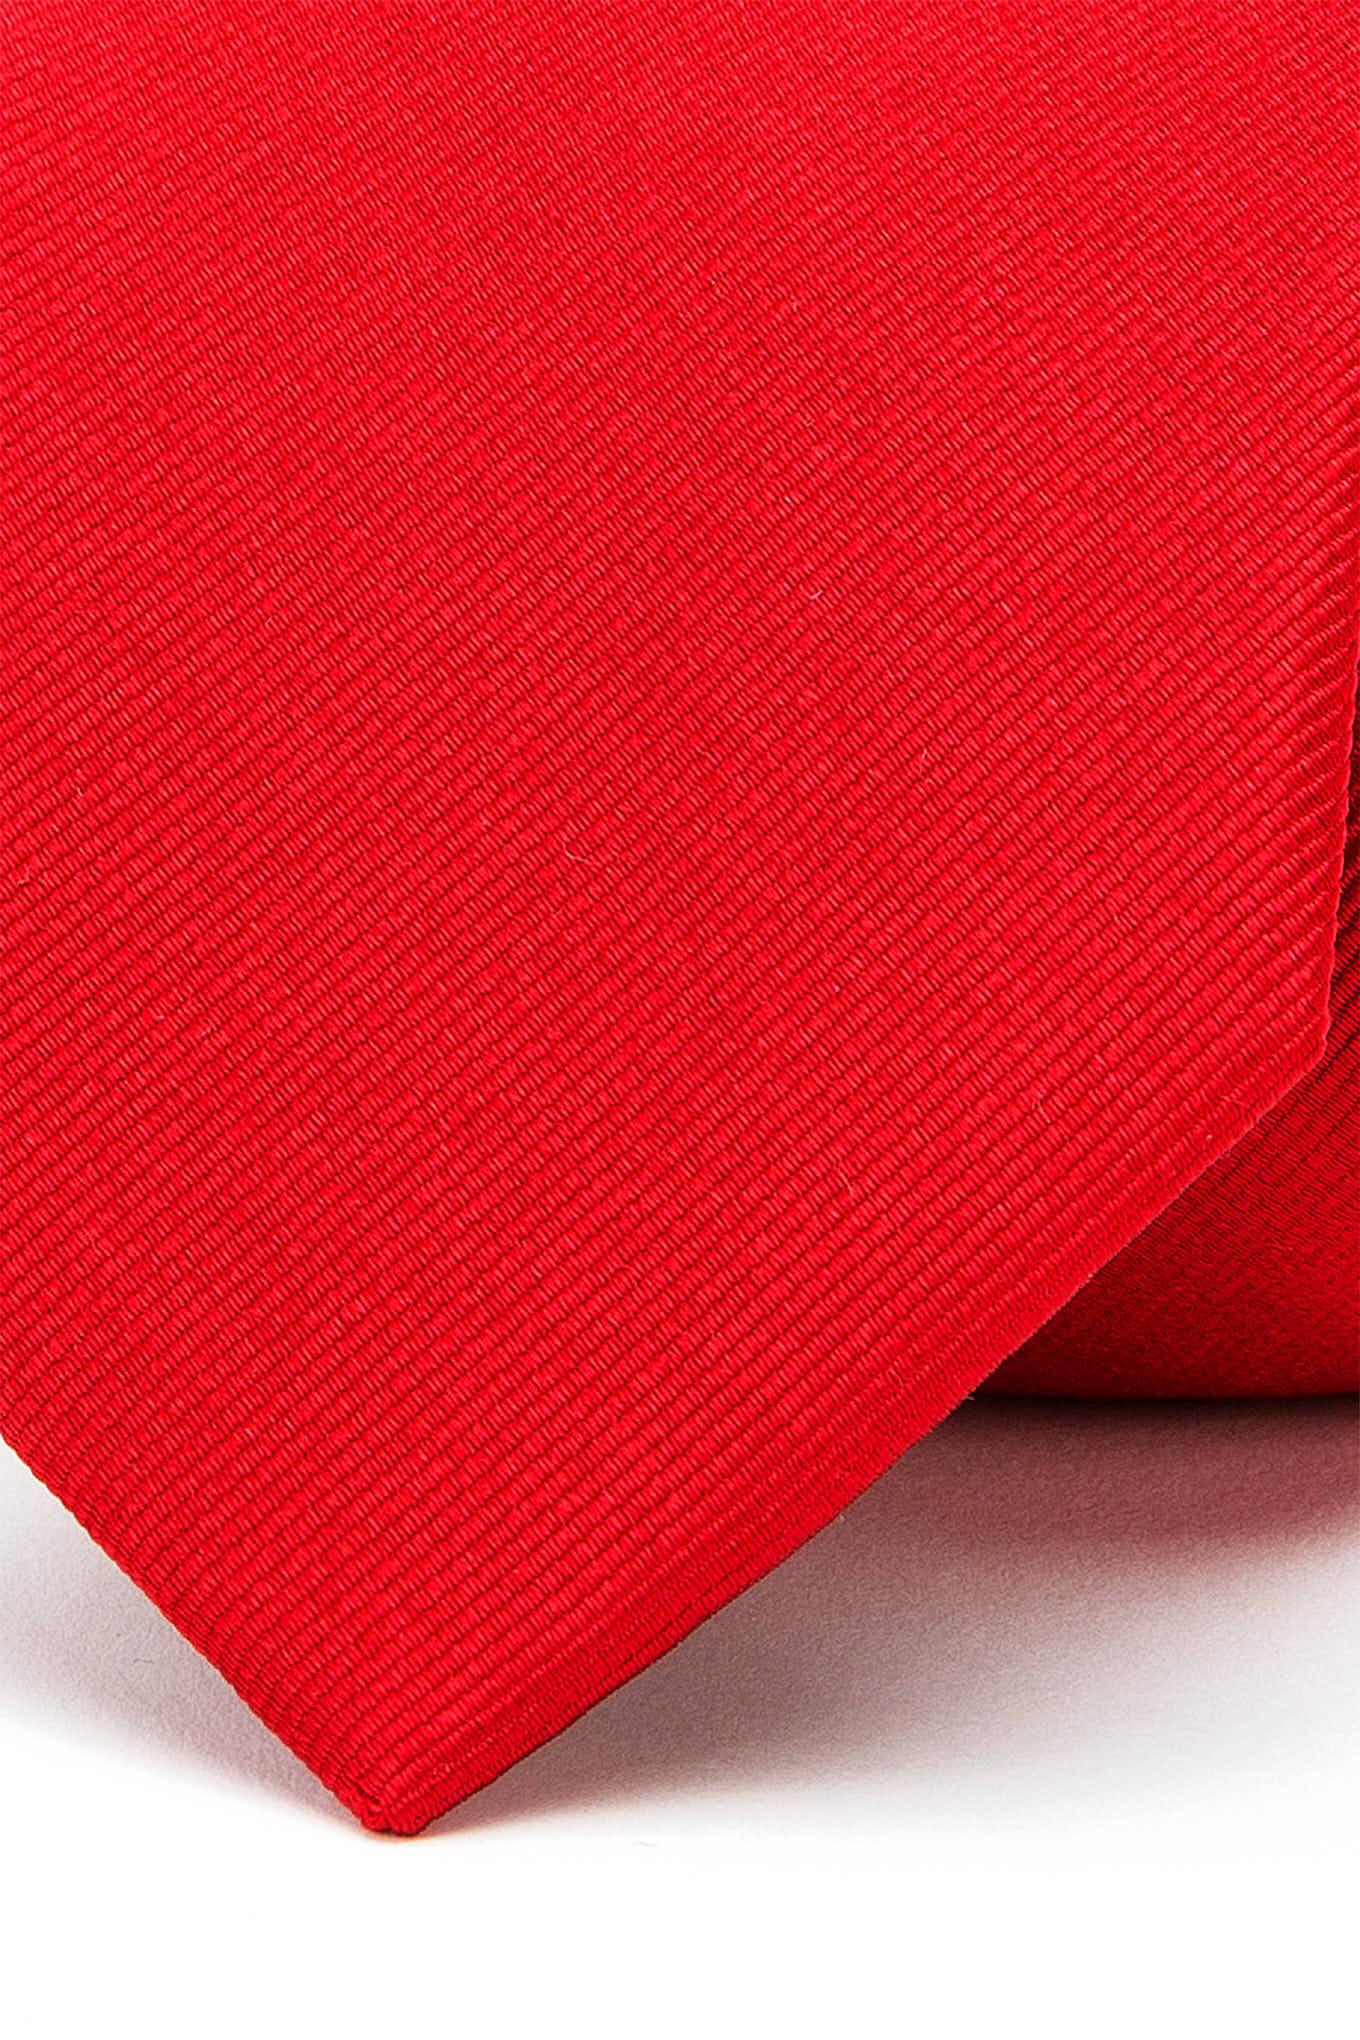 Tie Red Classic Man